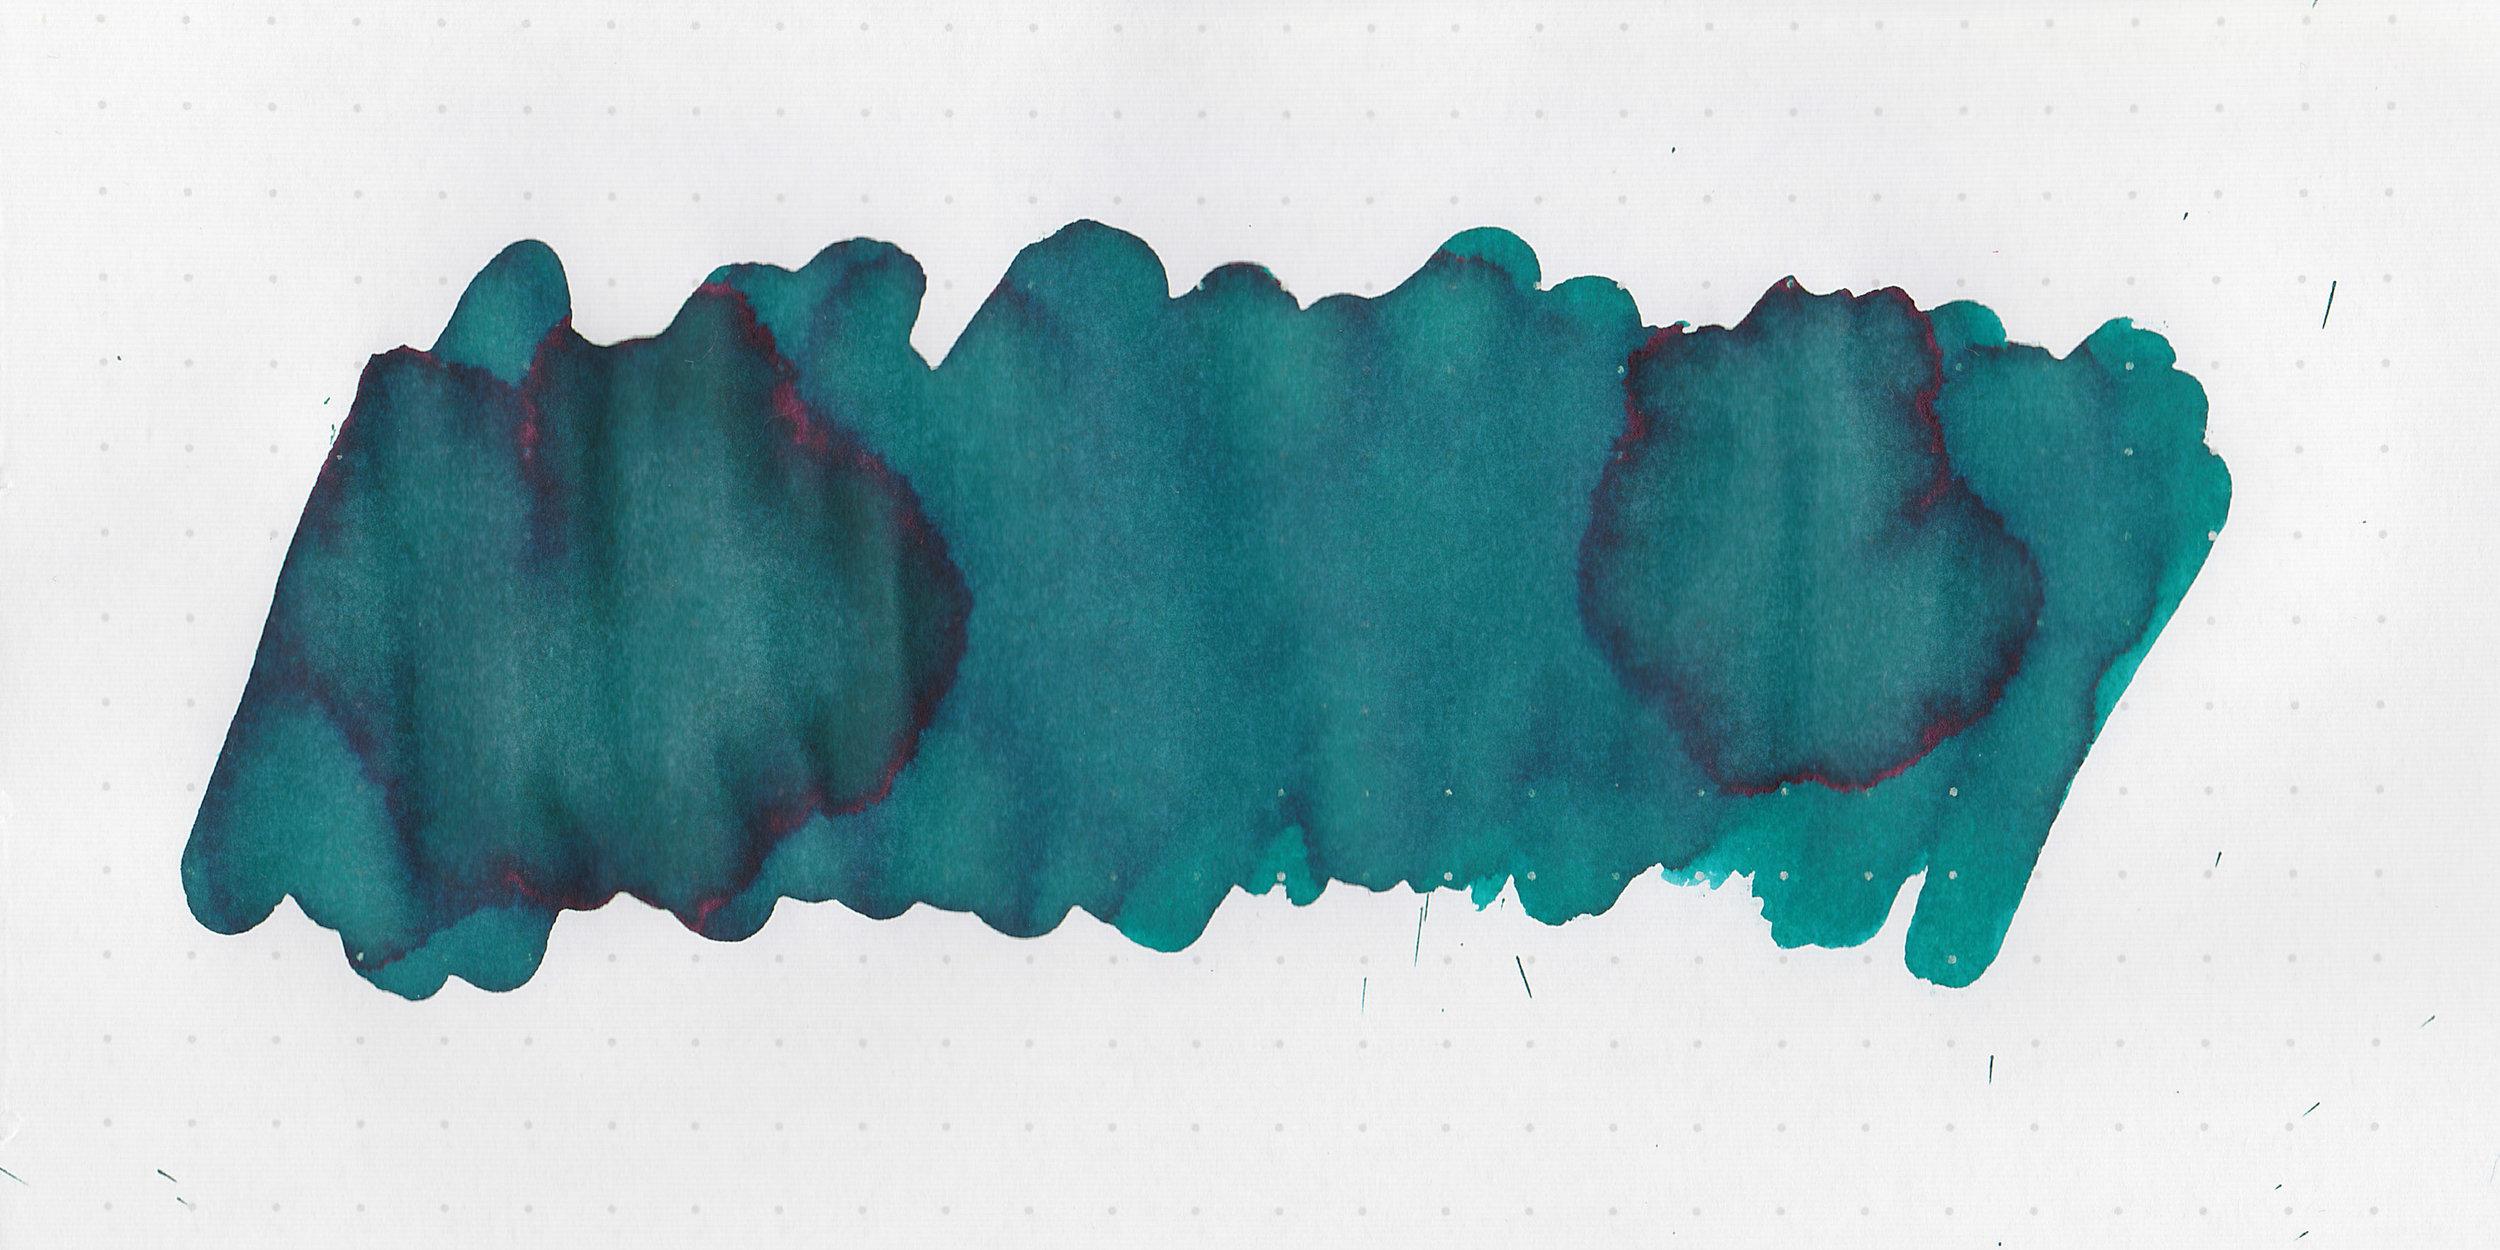 nood-turquoise-3.jpg